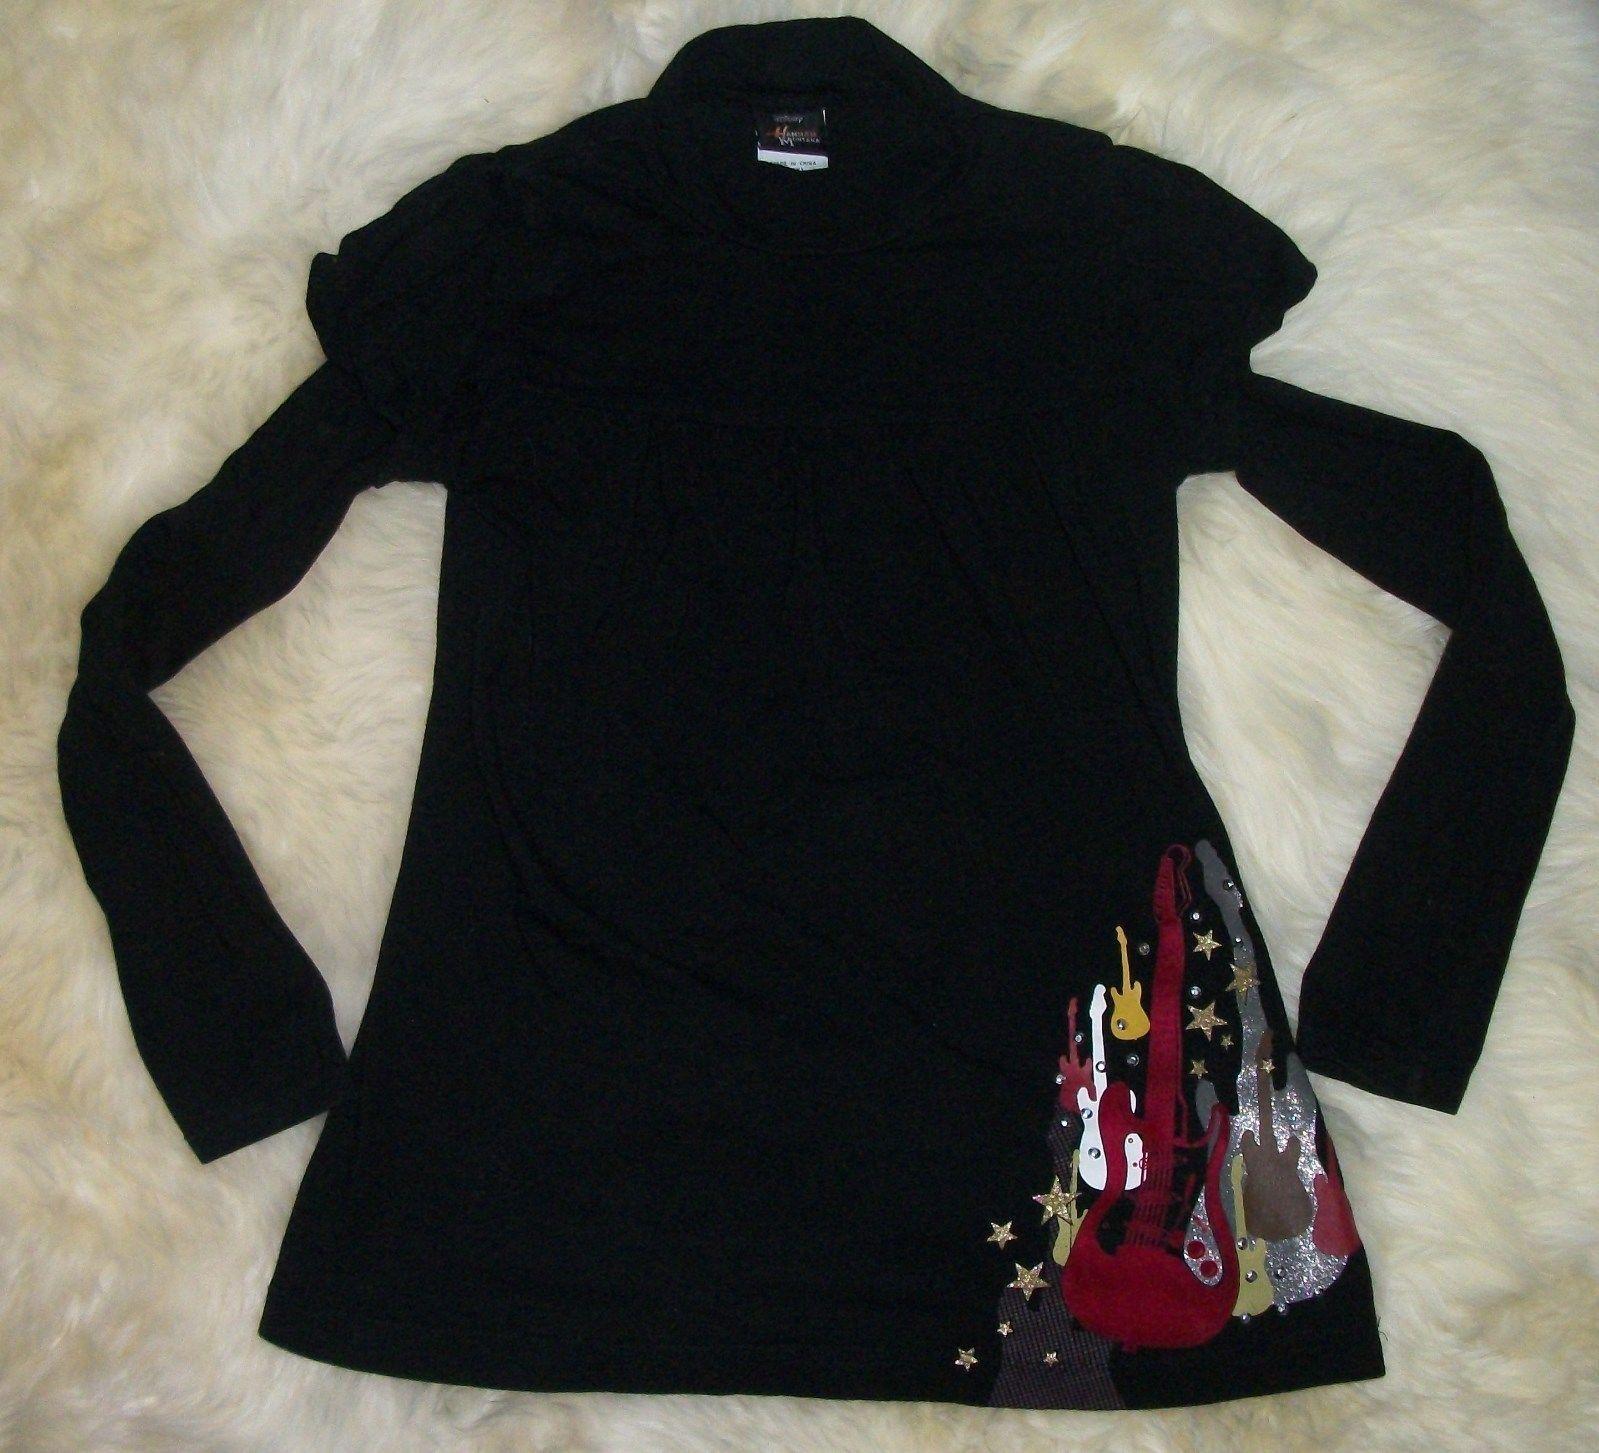 hanna montana shirt girls large 6x long sleeve guitars black rhinestones nice - $20.83